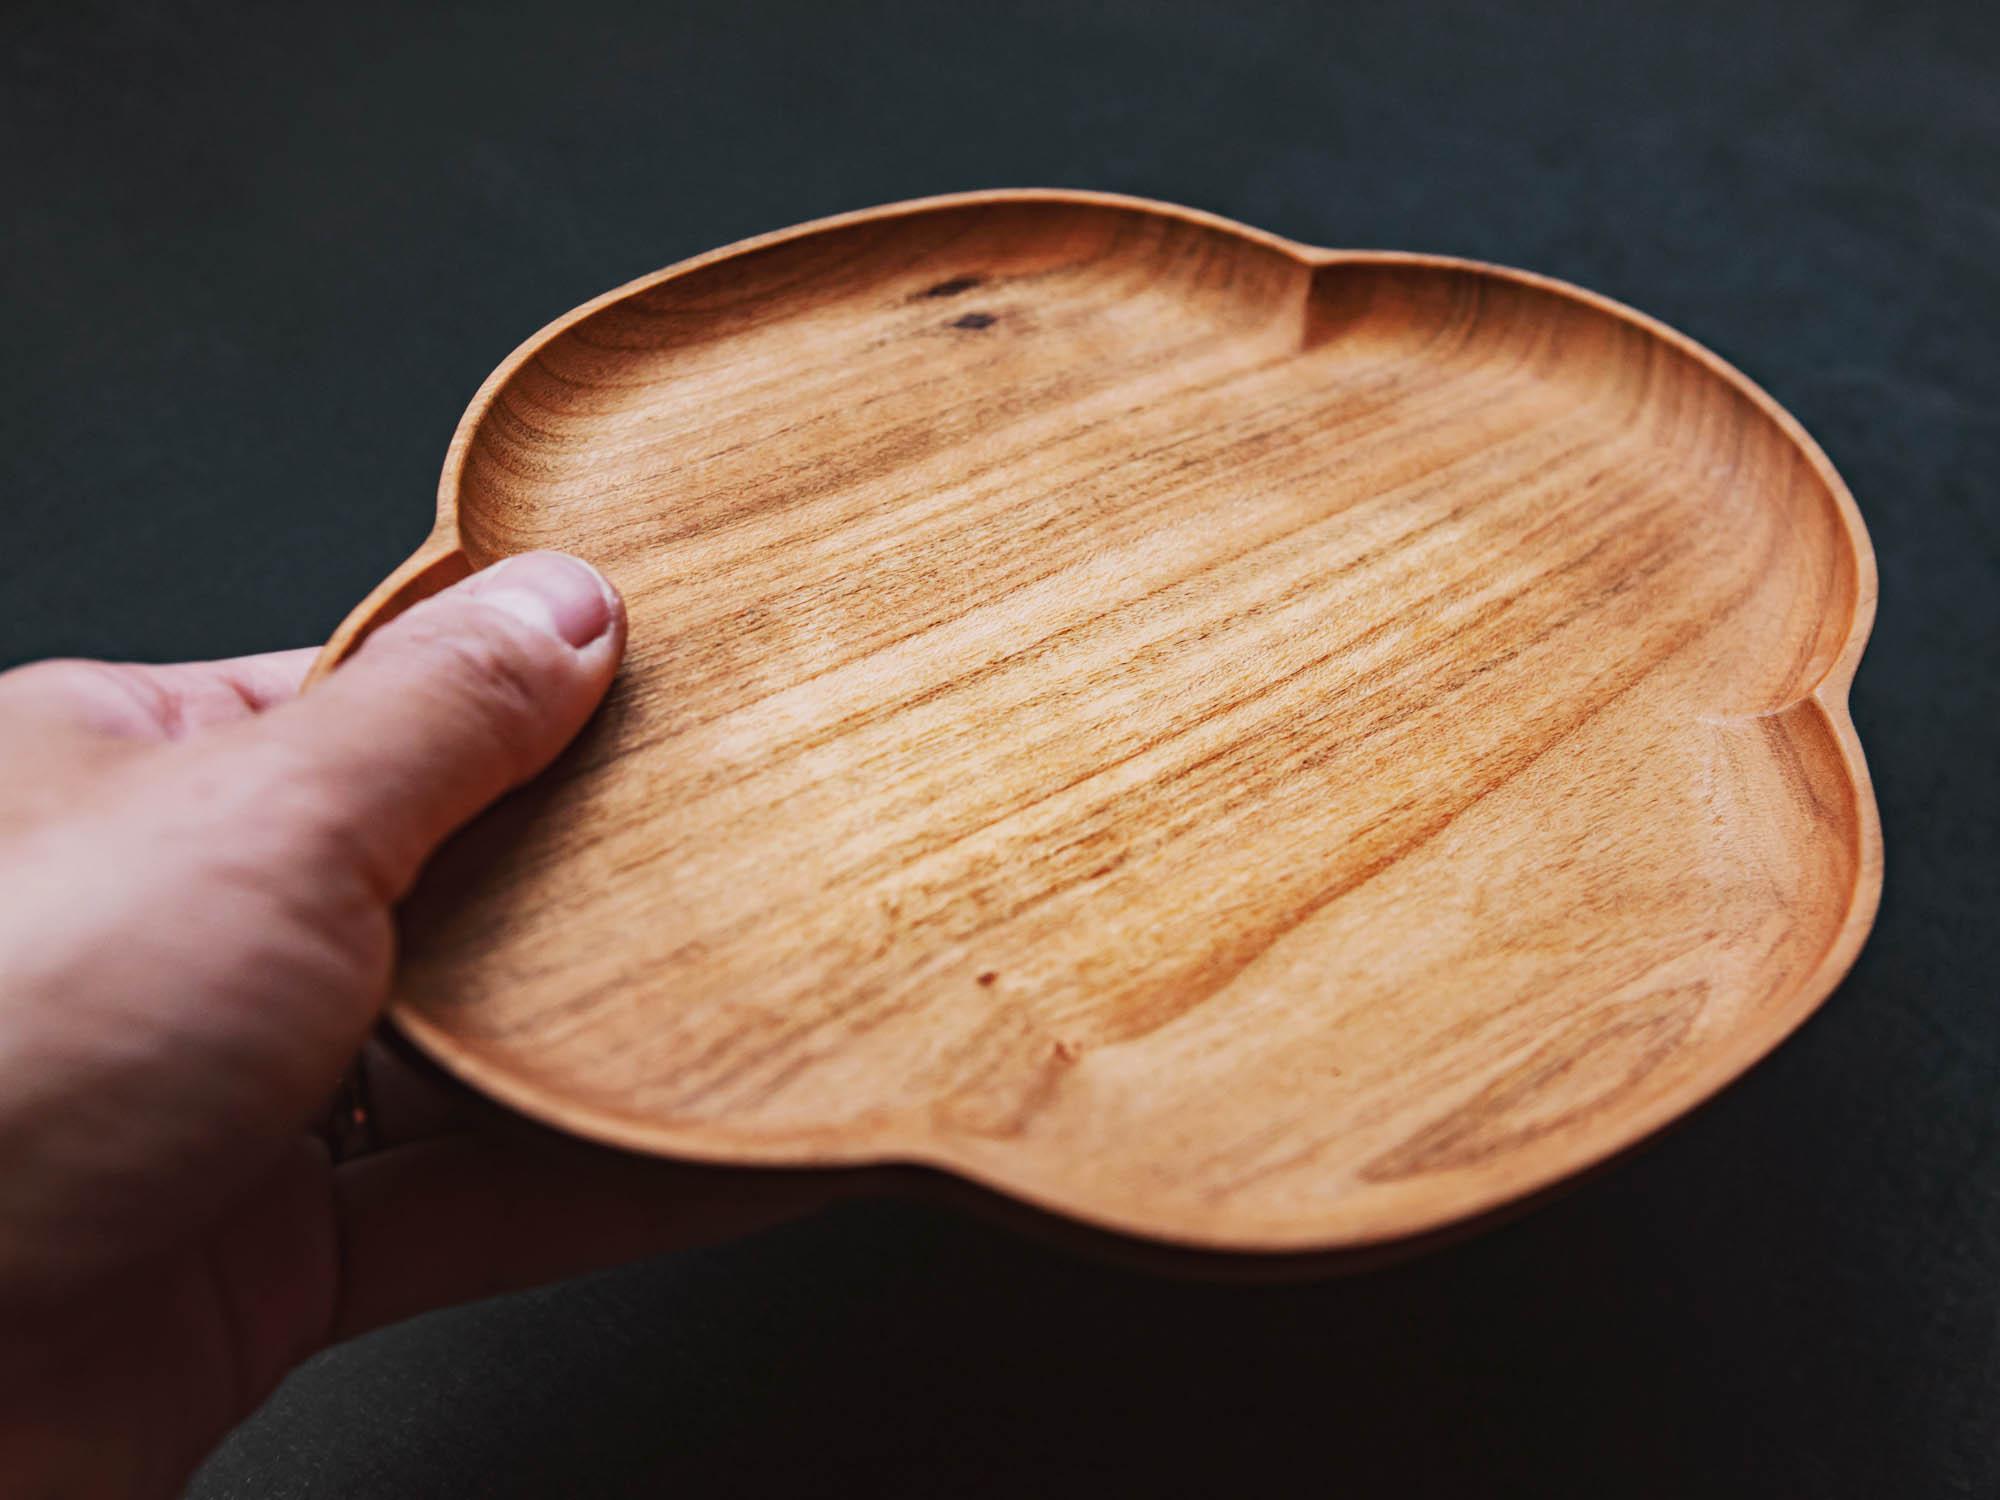 KITO 小皿 木瓜 四十沢木材工芸